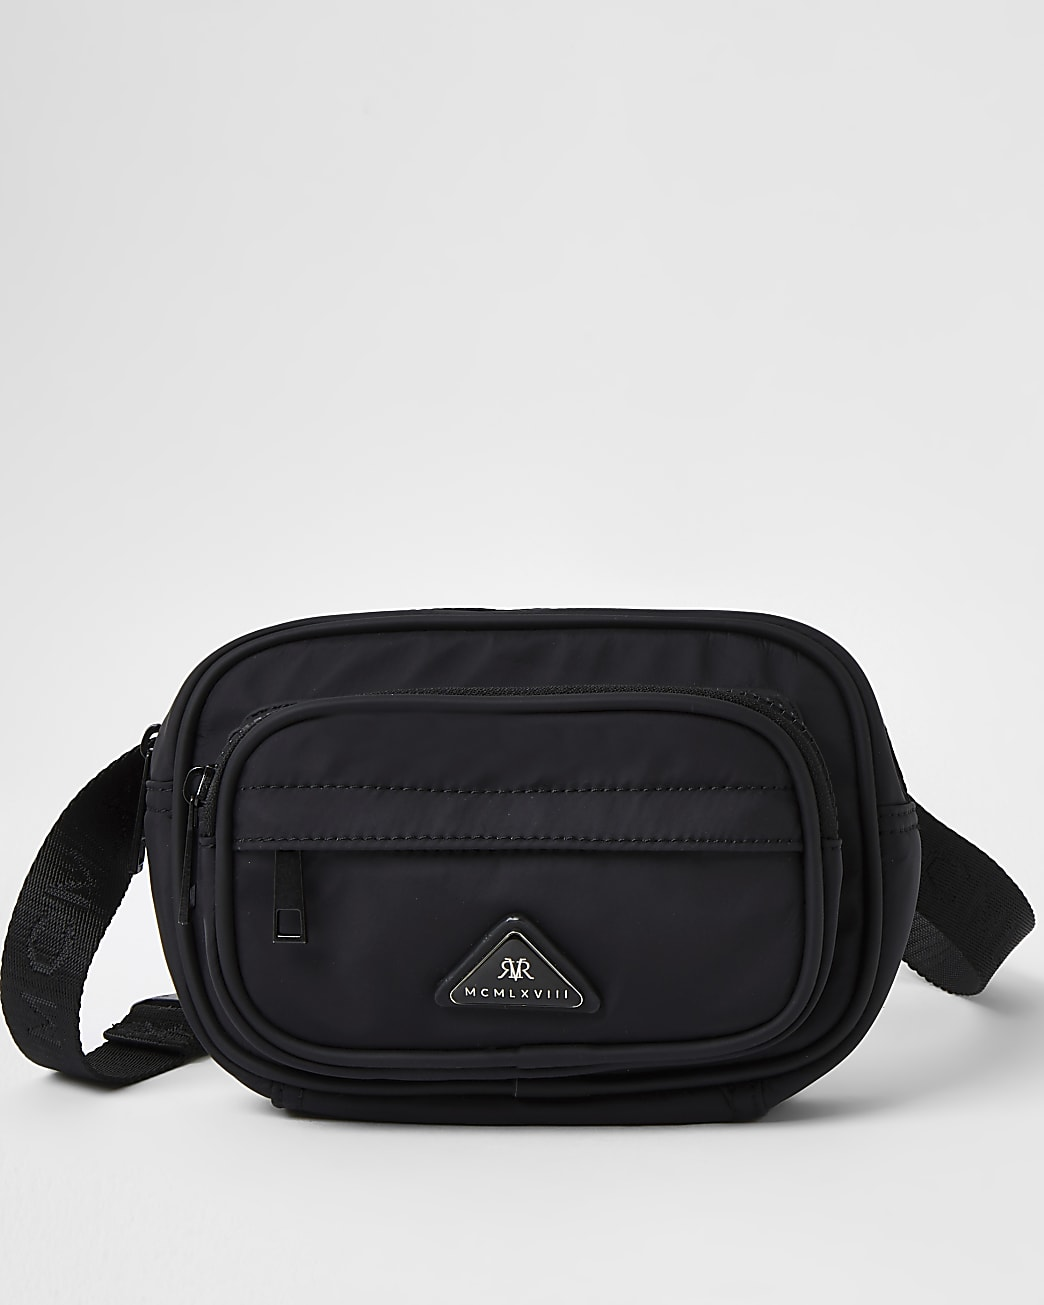 Black MCMLX cross body bag